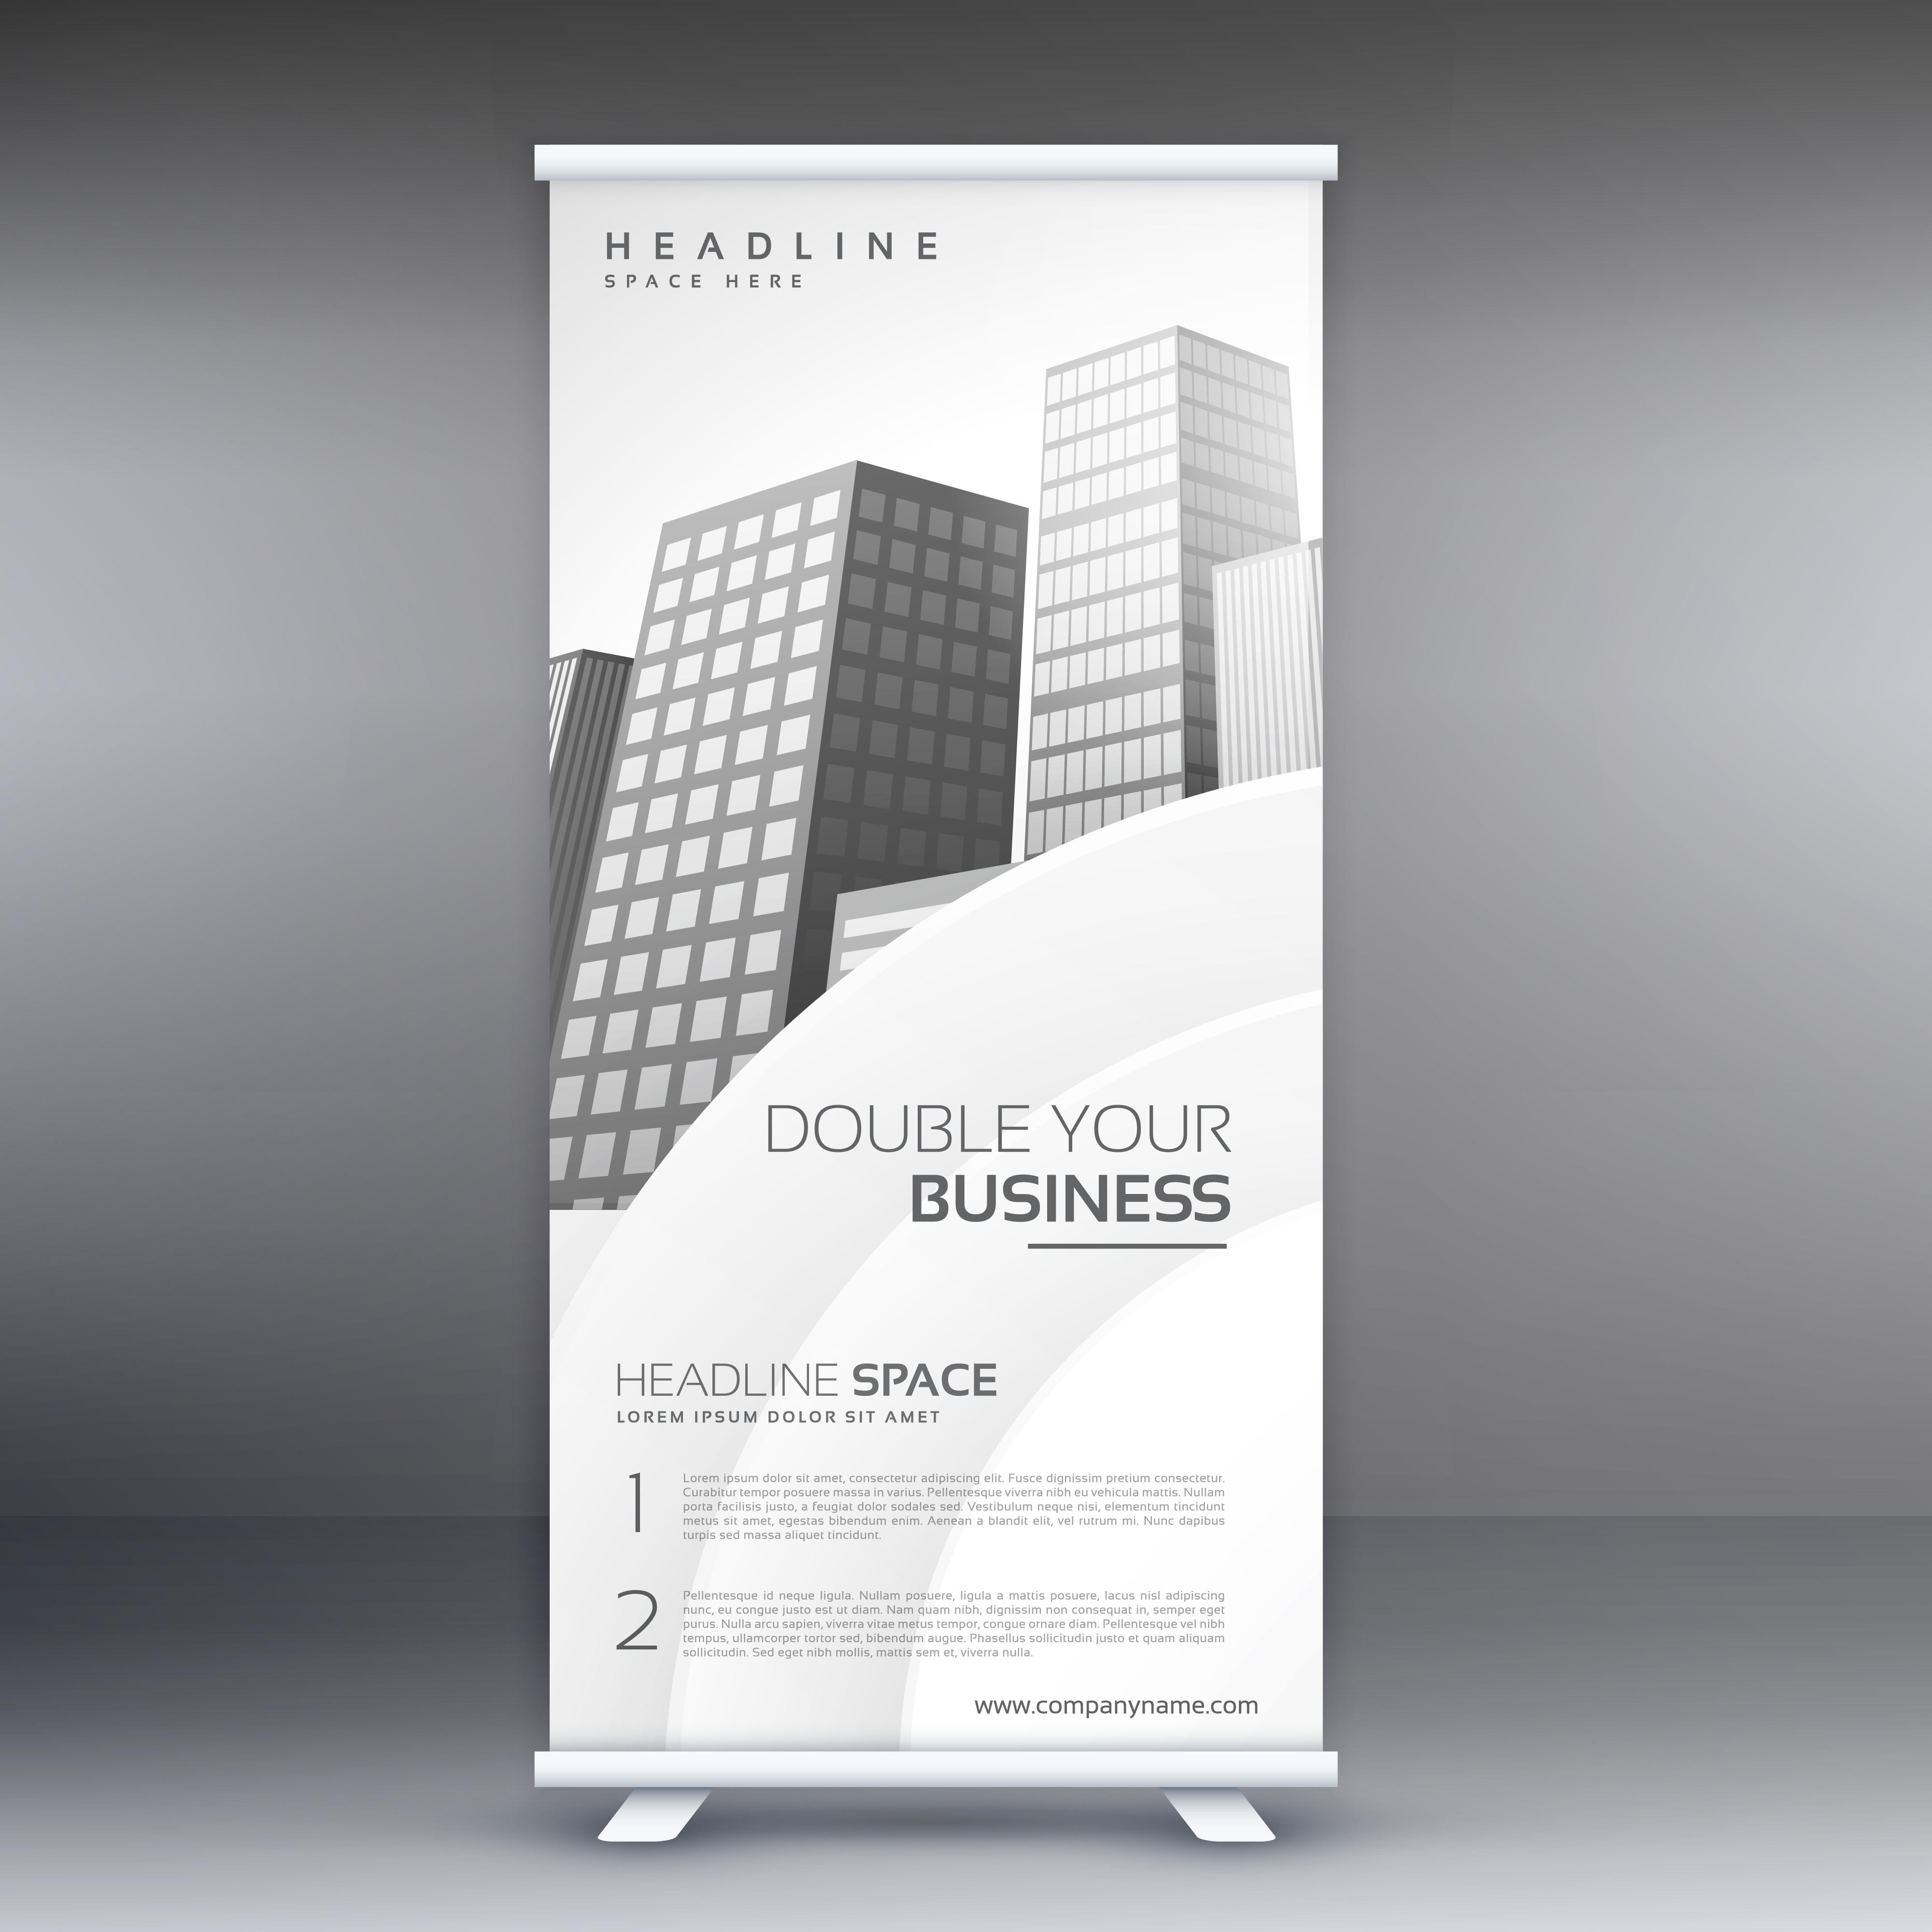 Elegant White Standee Roll Up Banner Design Template